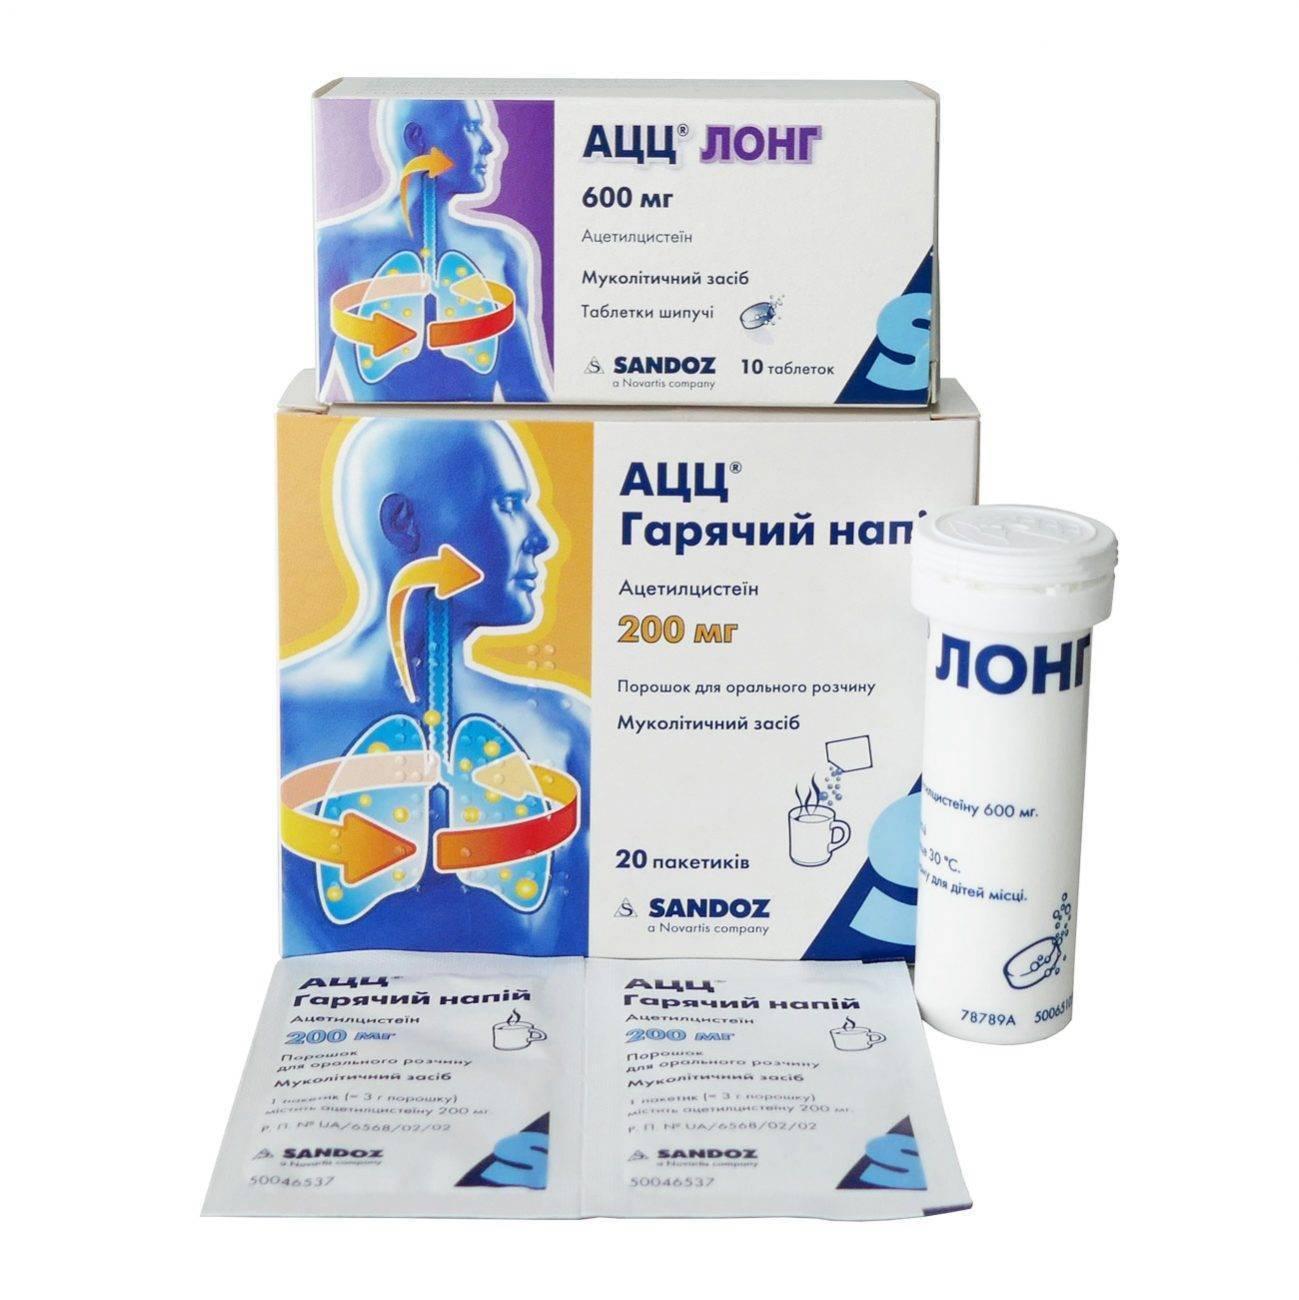 Ацц для детей: инструкция по применению сиропа, порошка, шипучих таблеток, суспензии у ребенка / mama66.ru